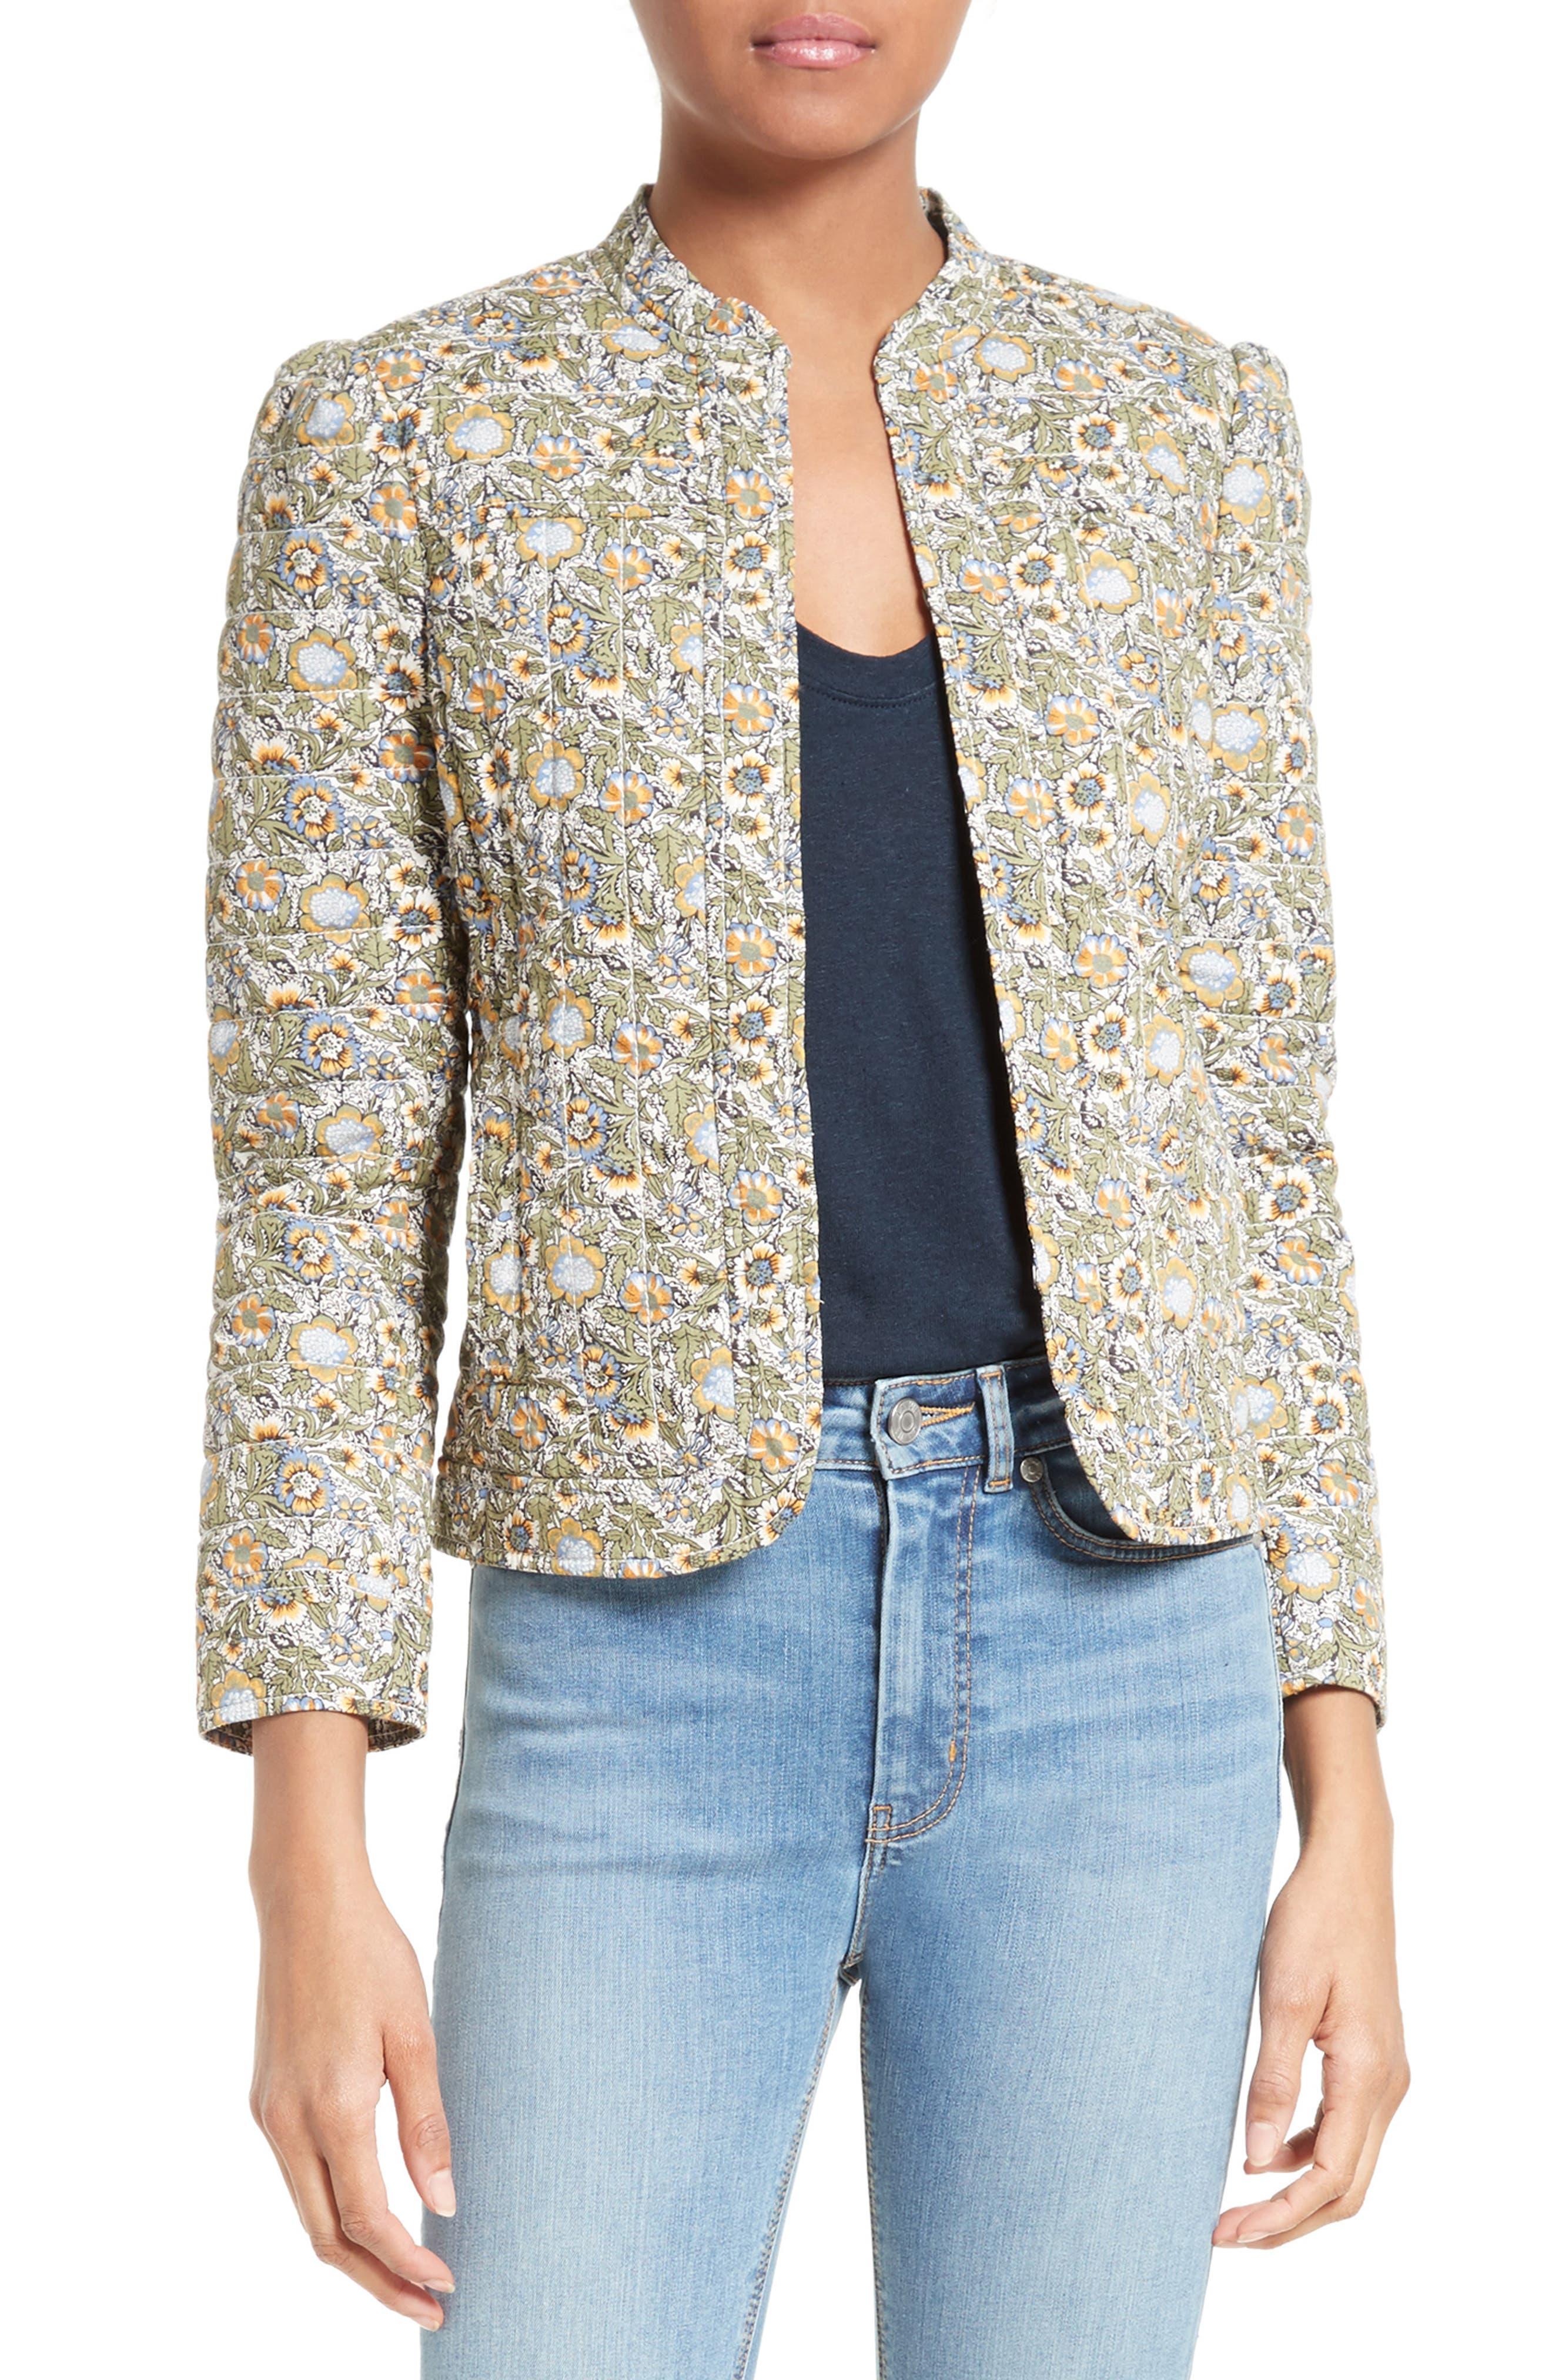 La Vie Rebecca Taylor French Marigold Cotton Jacket